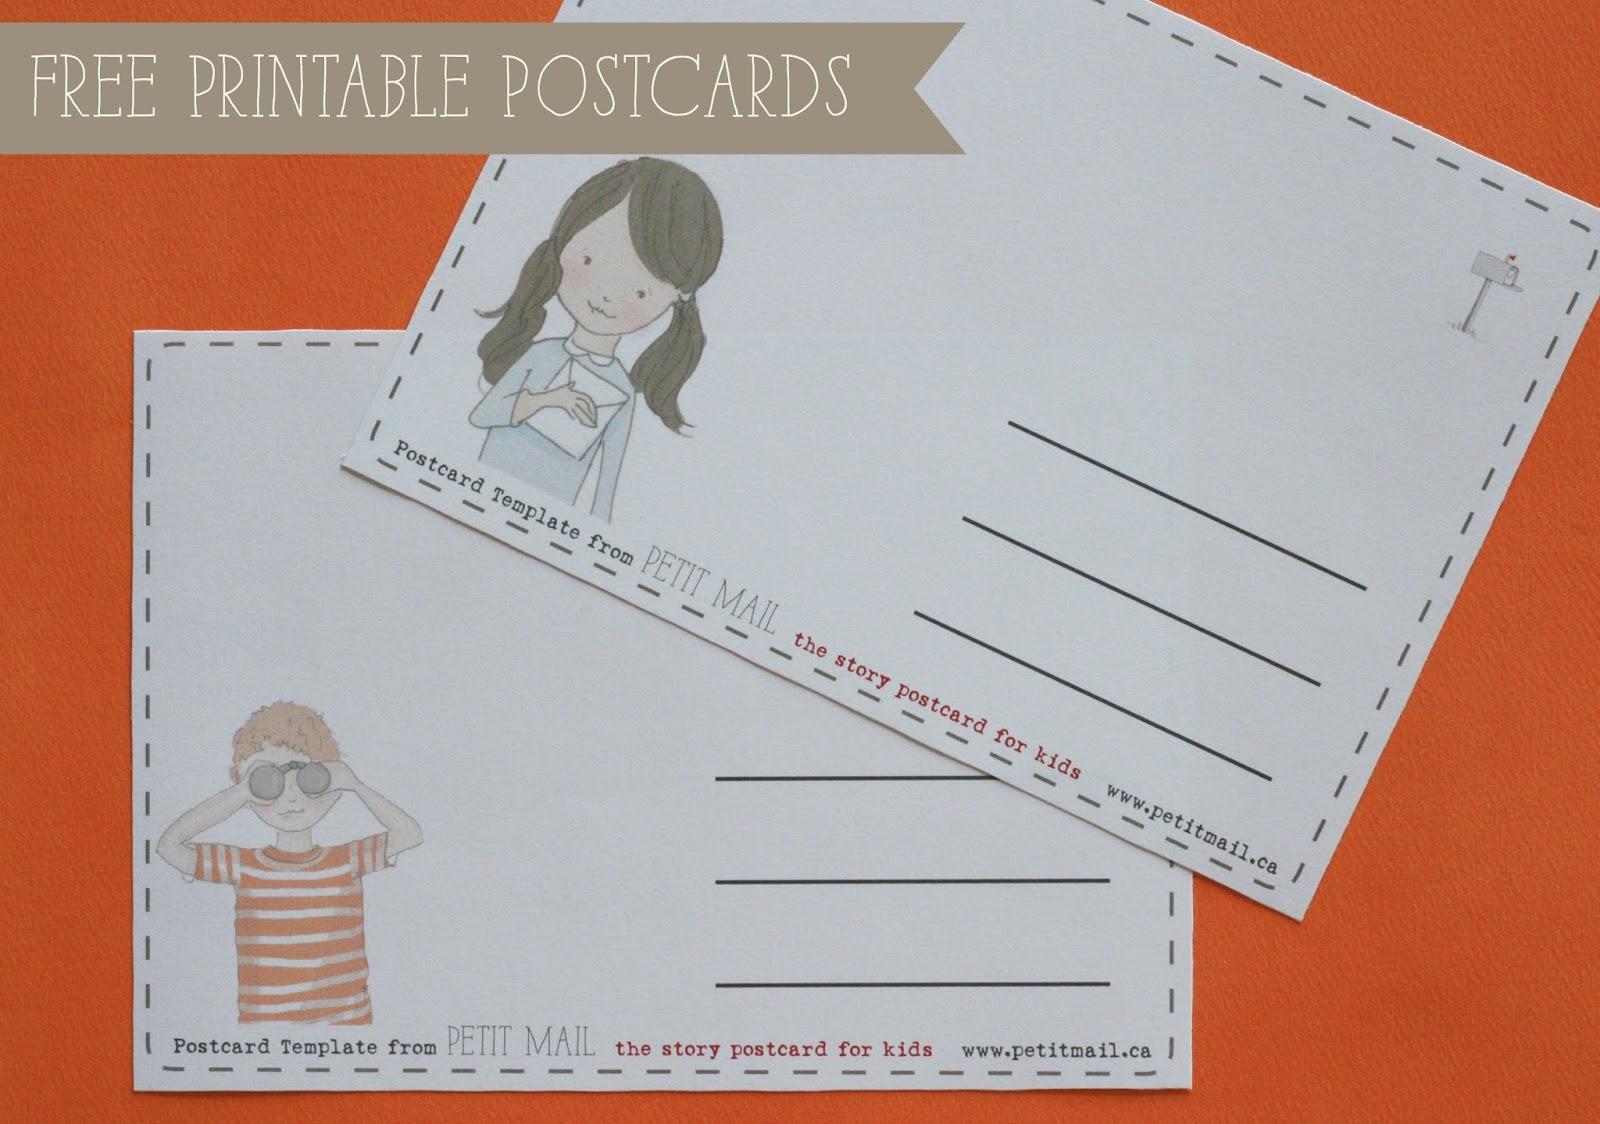 printable postcard for kids petit mail